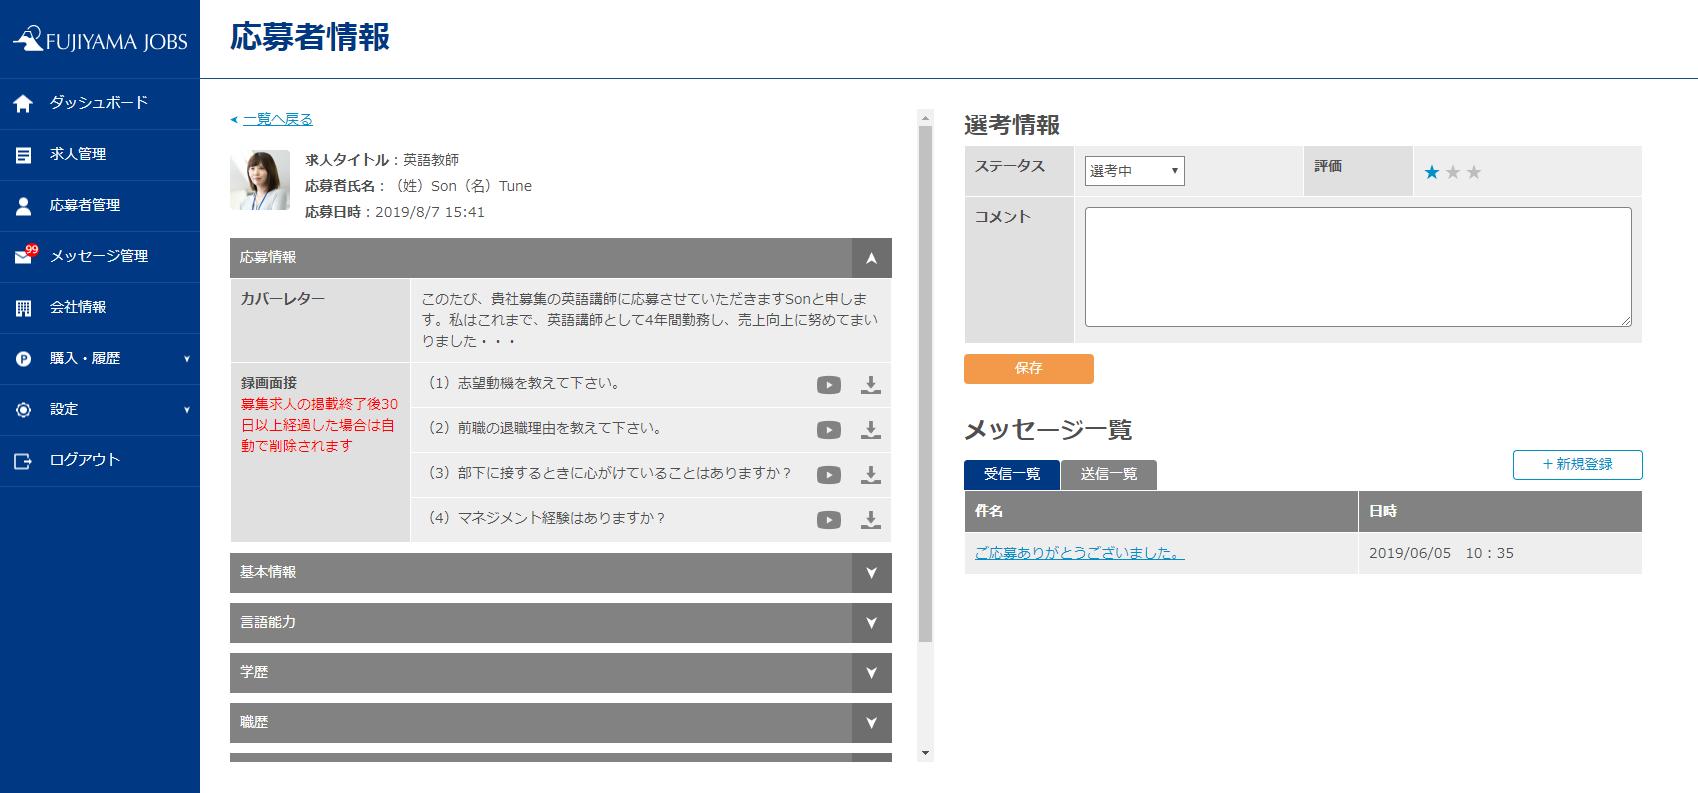 「FUJIYAMA JOBS」管理画面イメージ